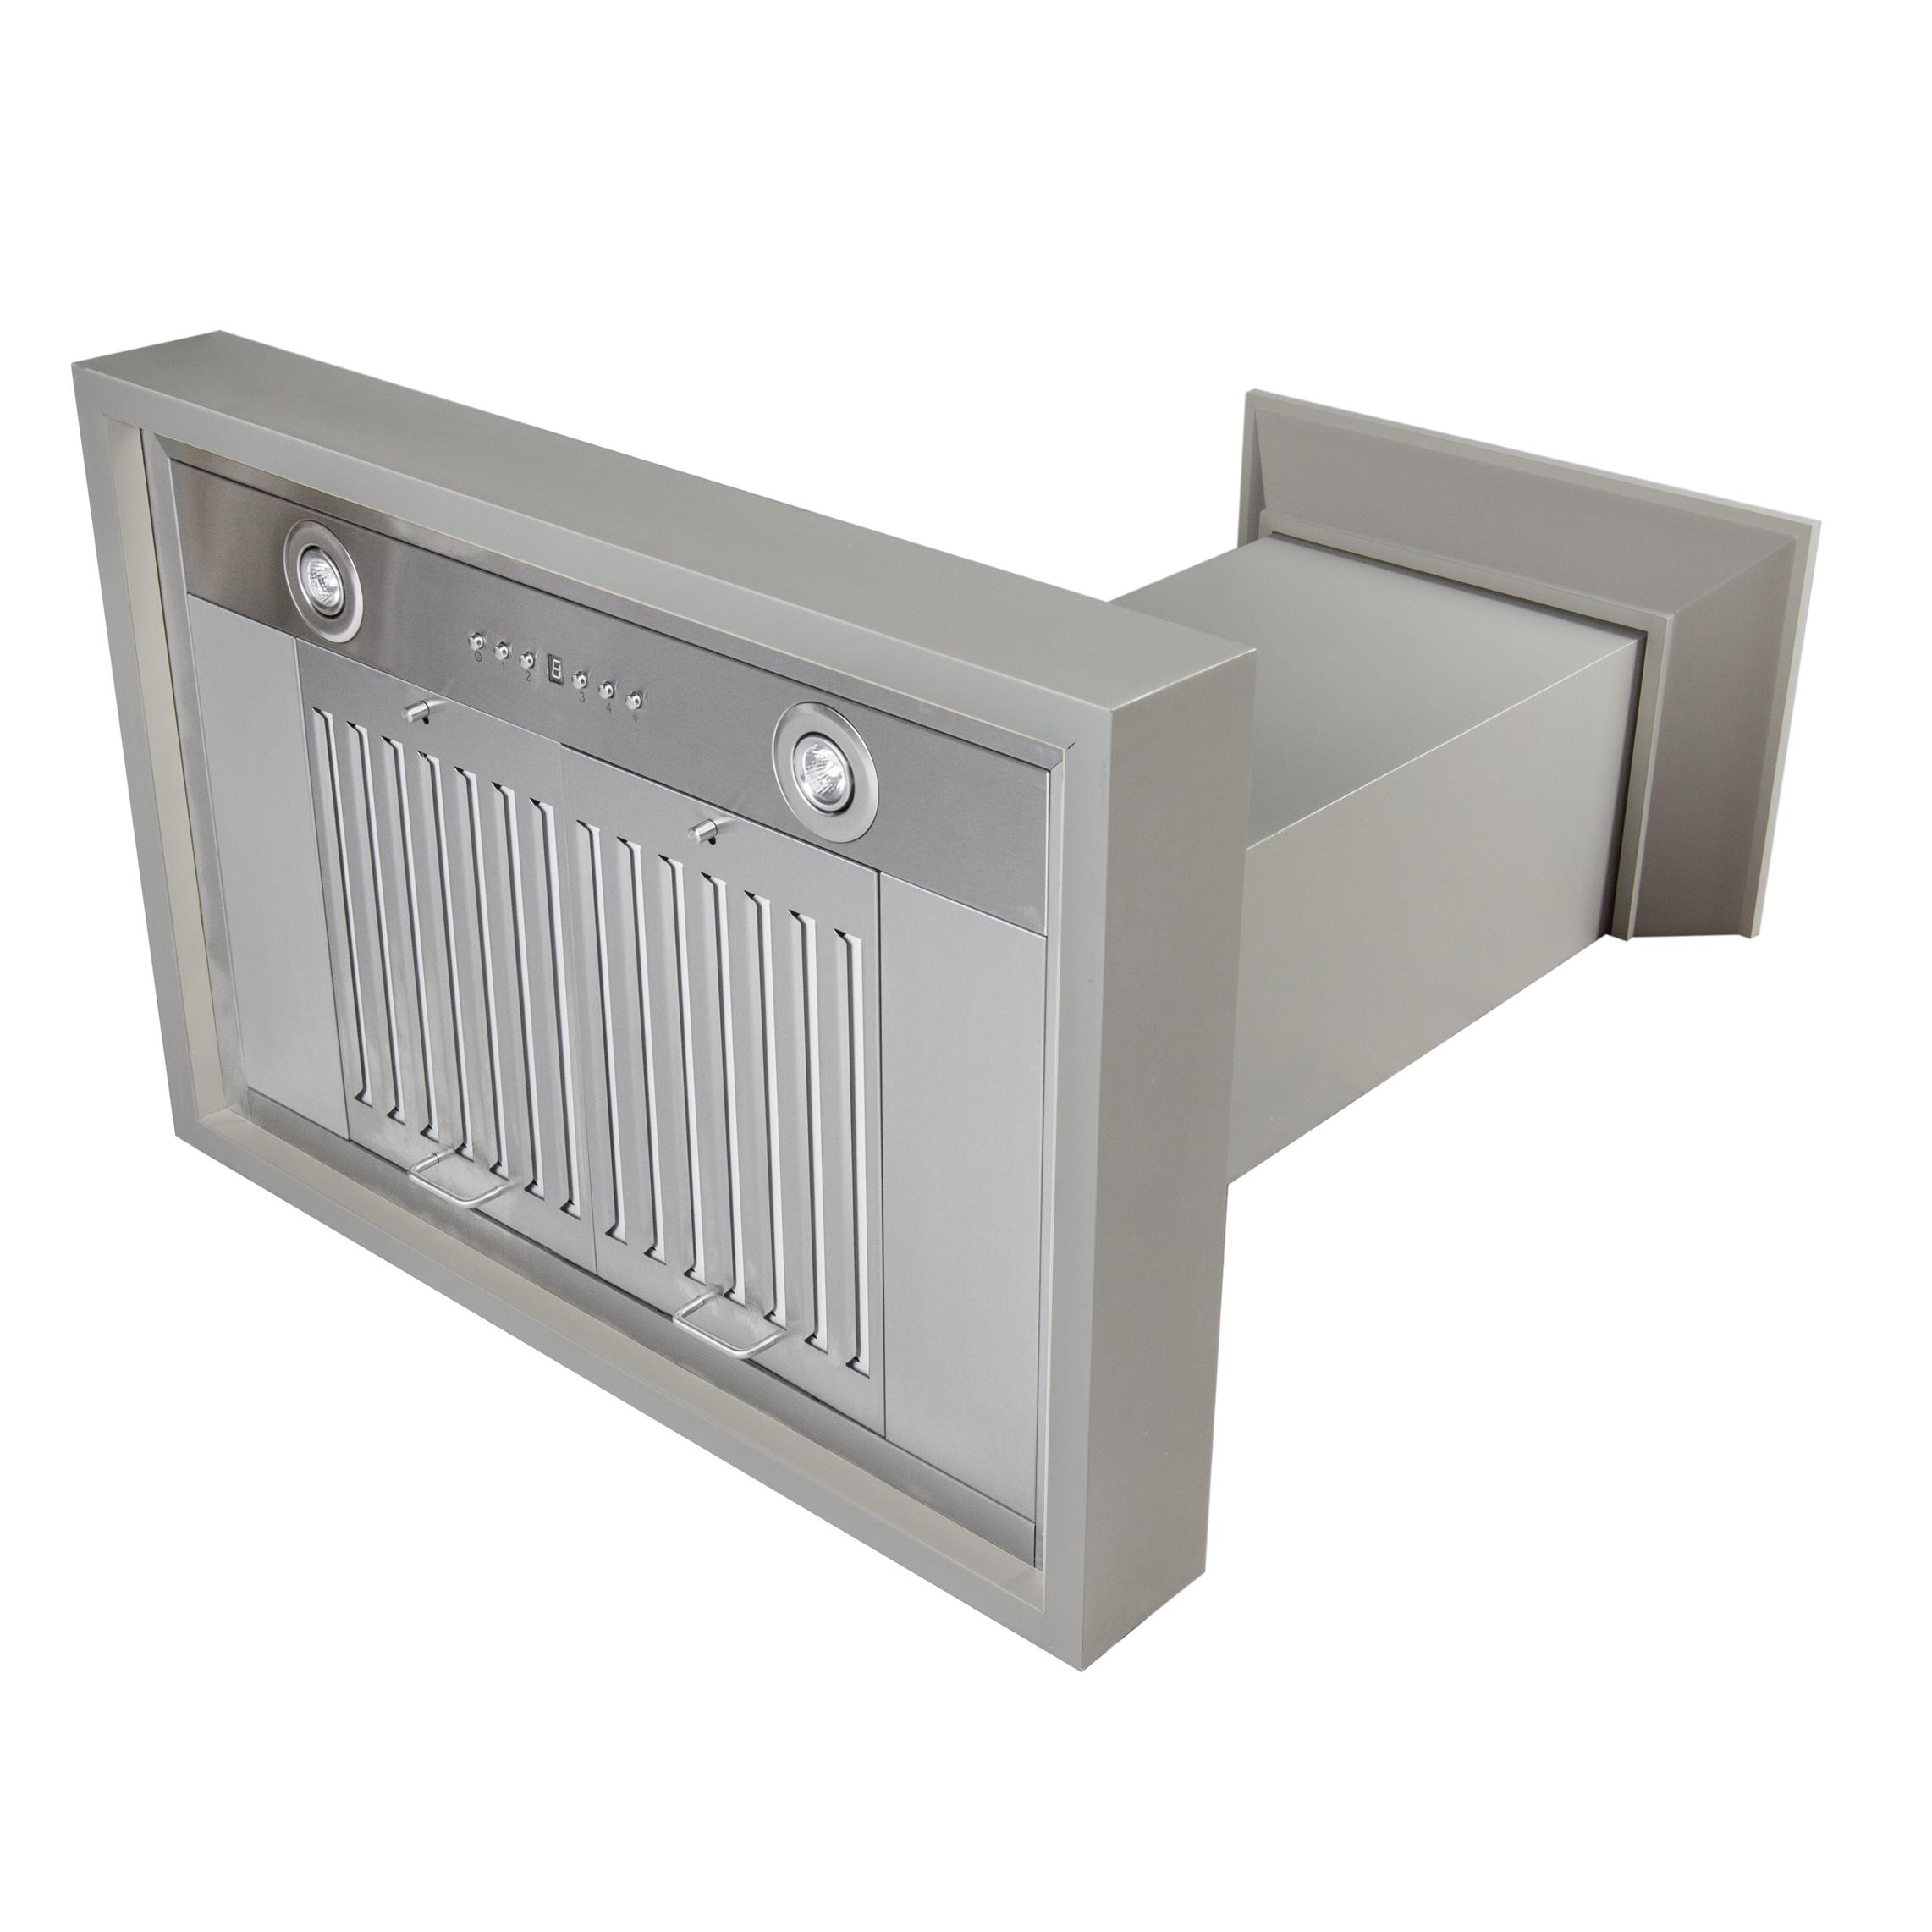 zline-designer-wood-range-hood-KBUU-side-under.jpg